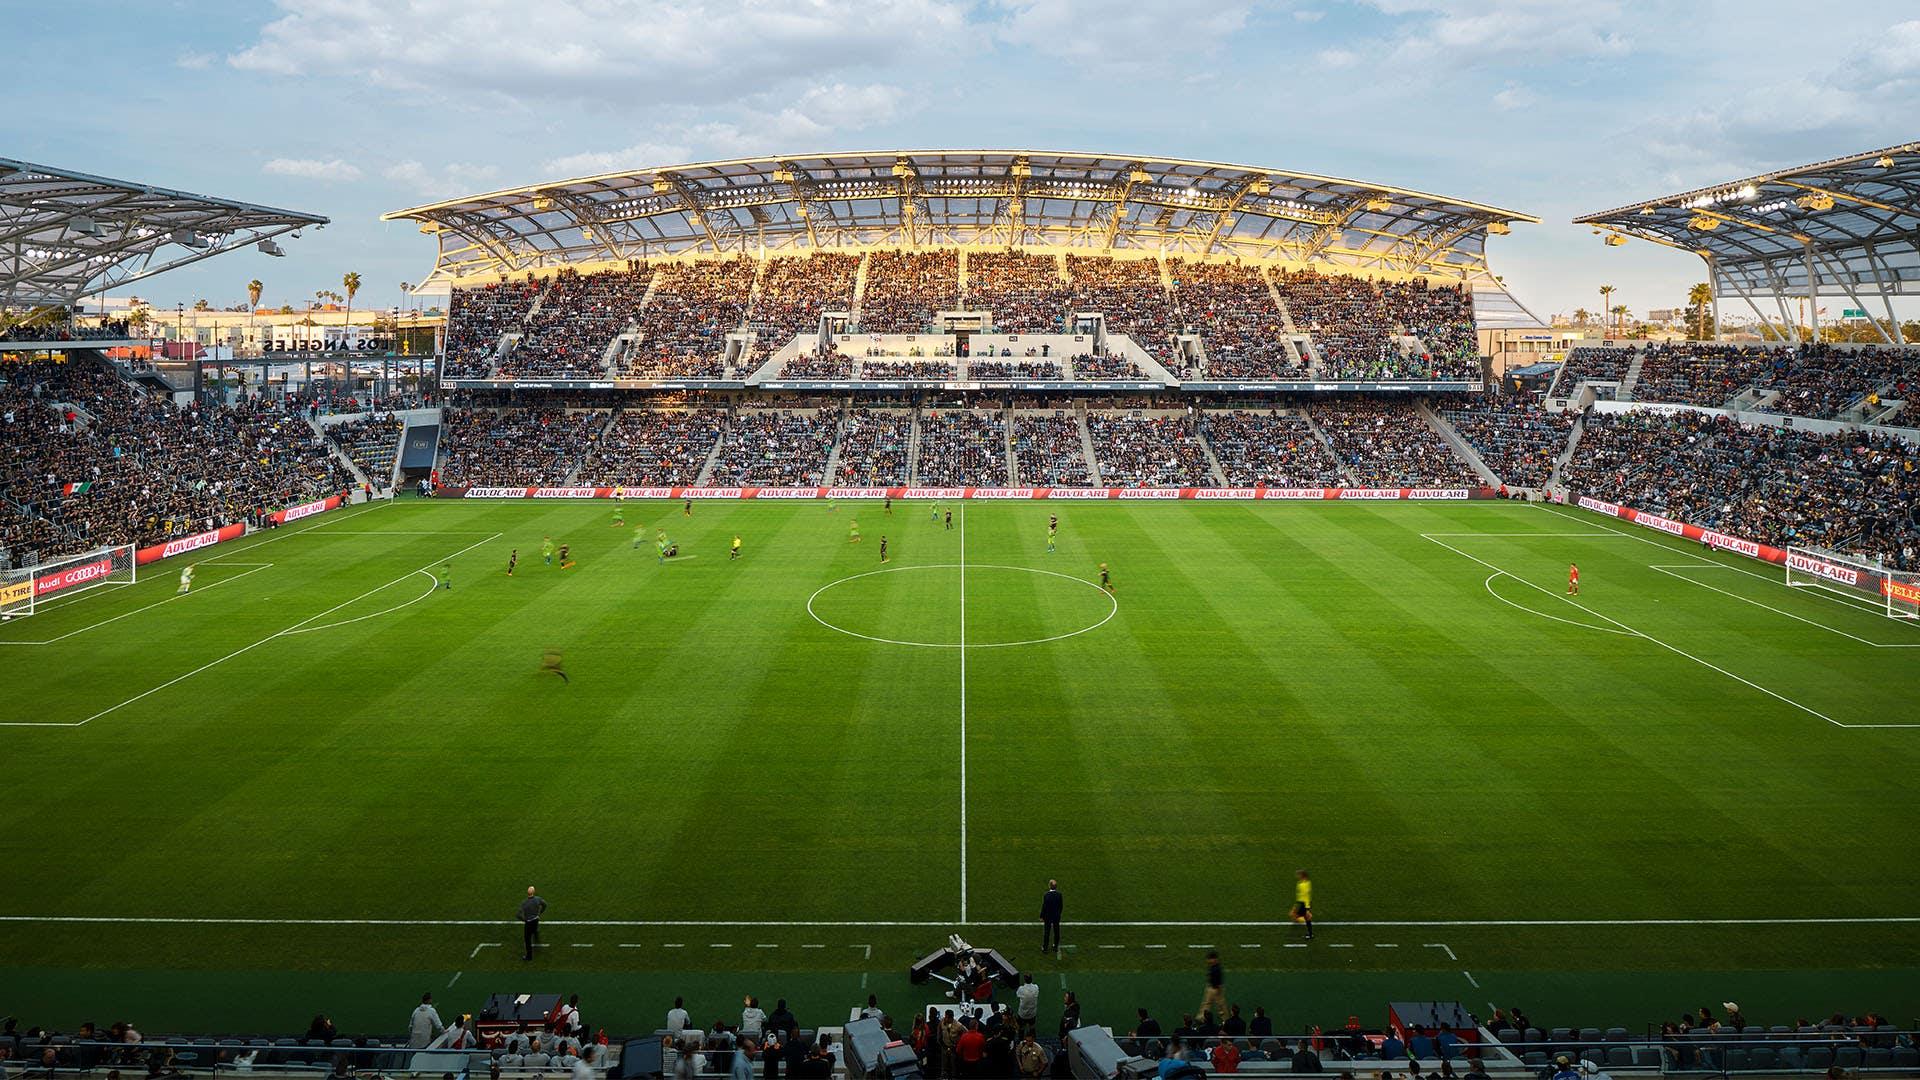 LAFC match at Bank of California Stadium